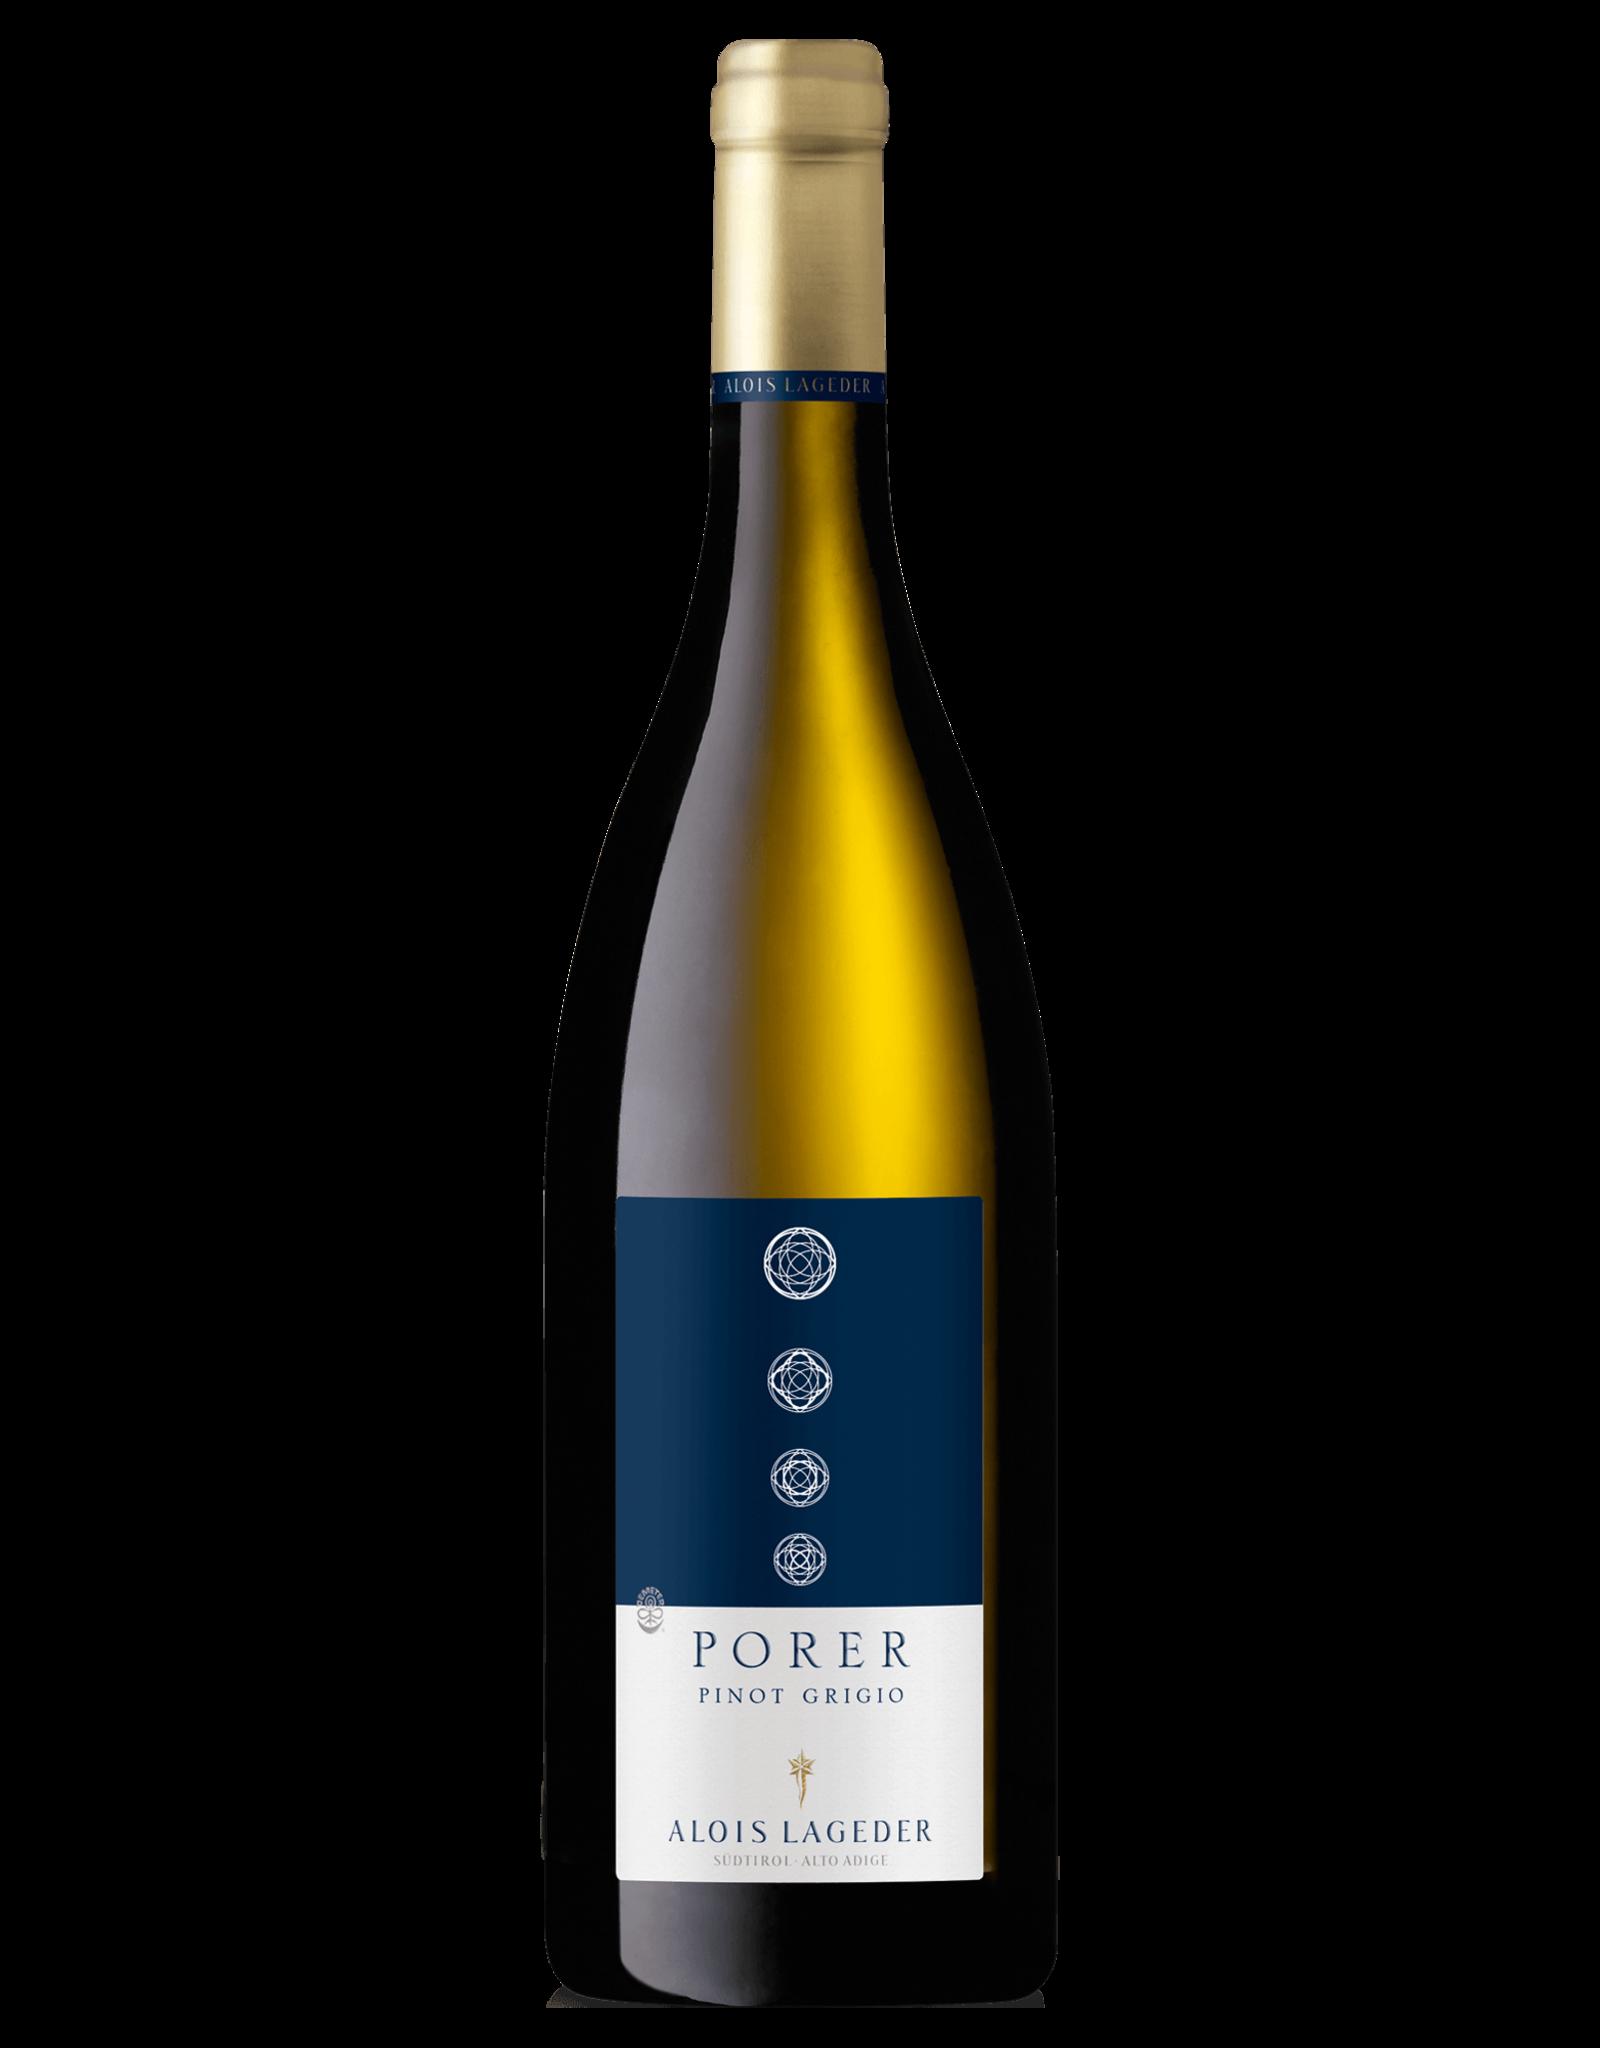 Proef Alois Lageder Porer Pinot Grigio